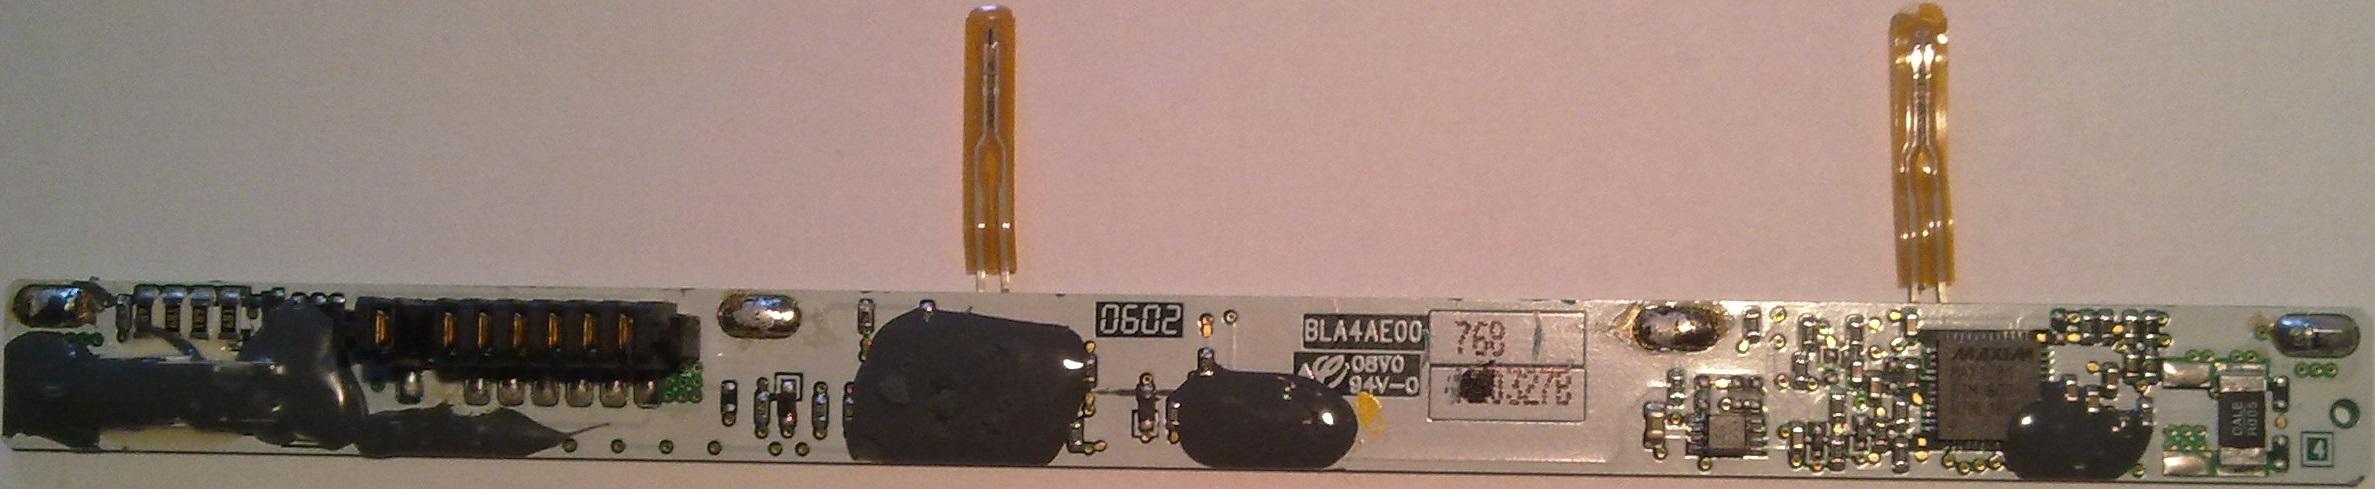 Reset elektroniki (BLA4AE00) z baterii PA3399U-2BRS OD LAPTOPA Toshiba Terca A6